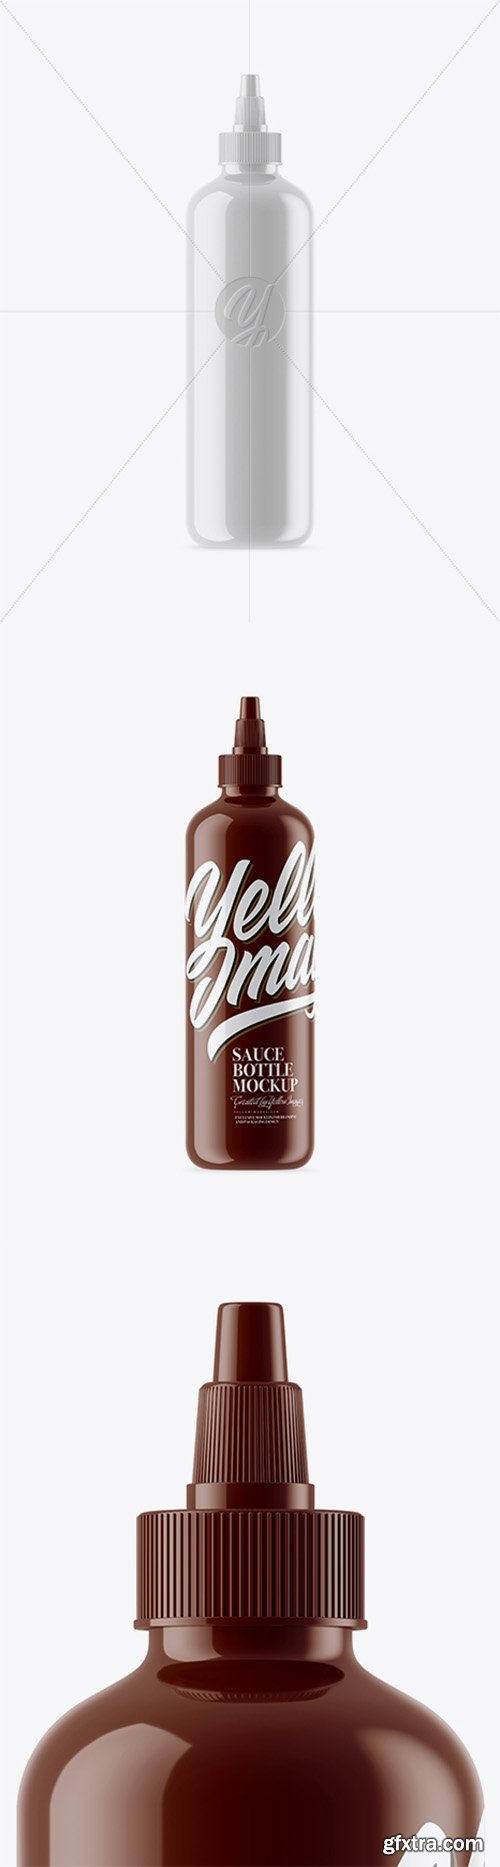 Glossy Sauce Bottle Mockup 21670